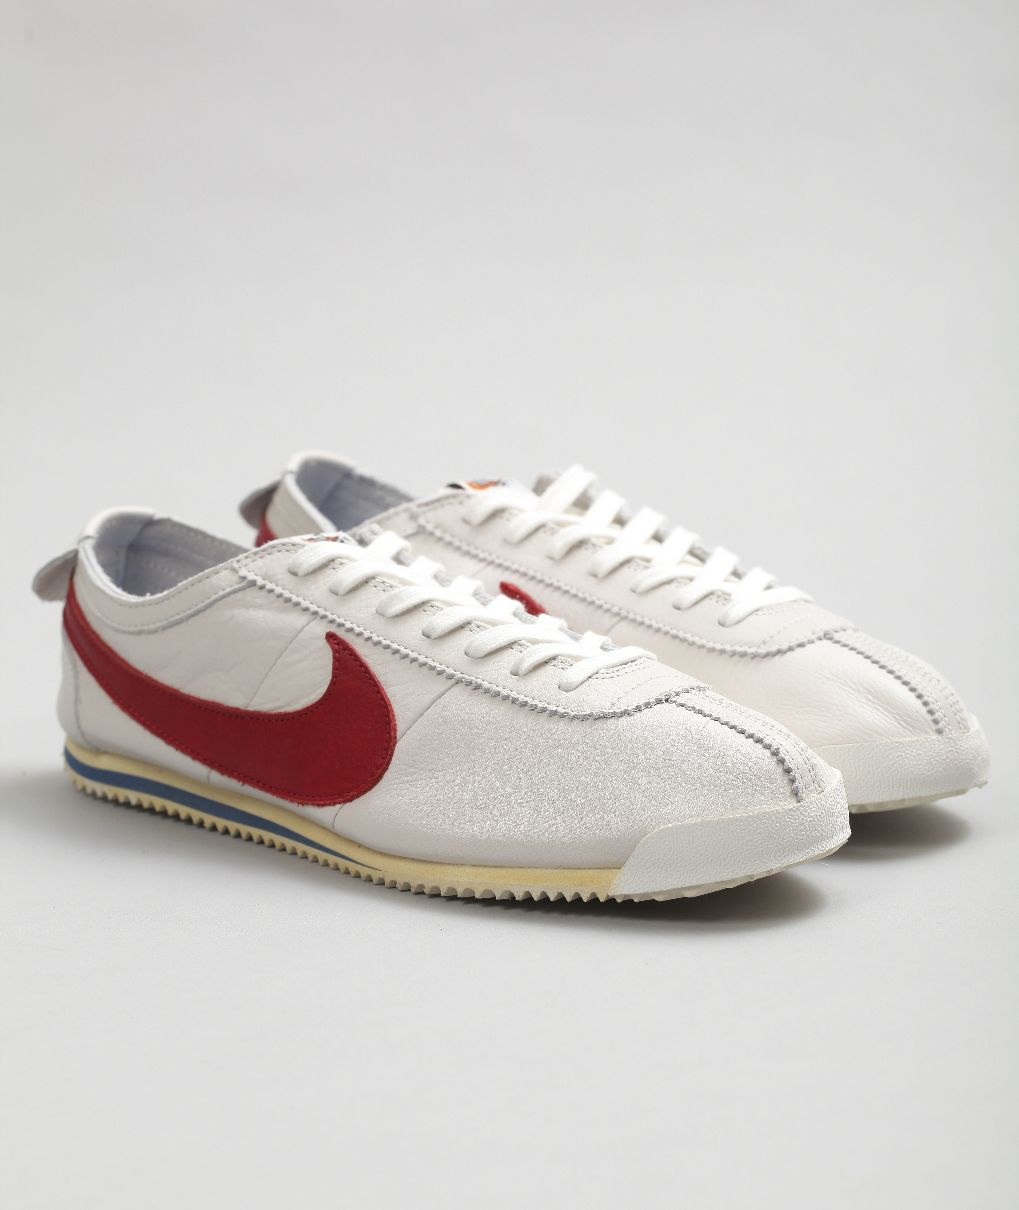 huge discount 6ccf4 7e9b1 Nike Cortez Classic OG Leather